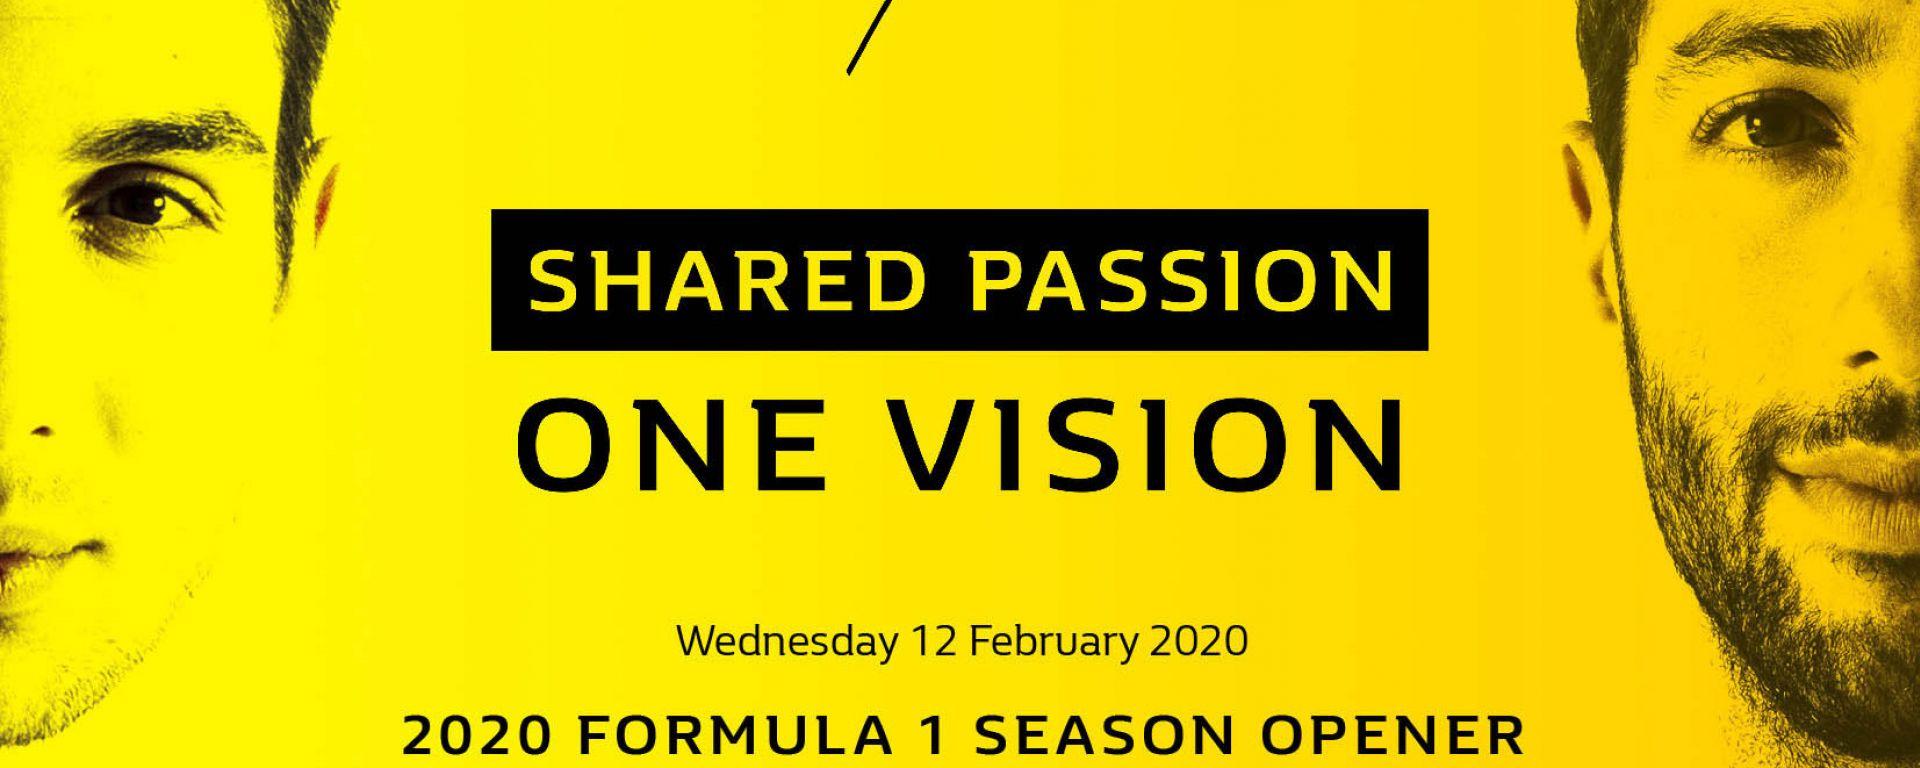 Renault F1 Team 2020 Formula 1 Season Opener